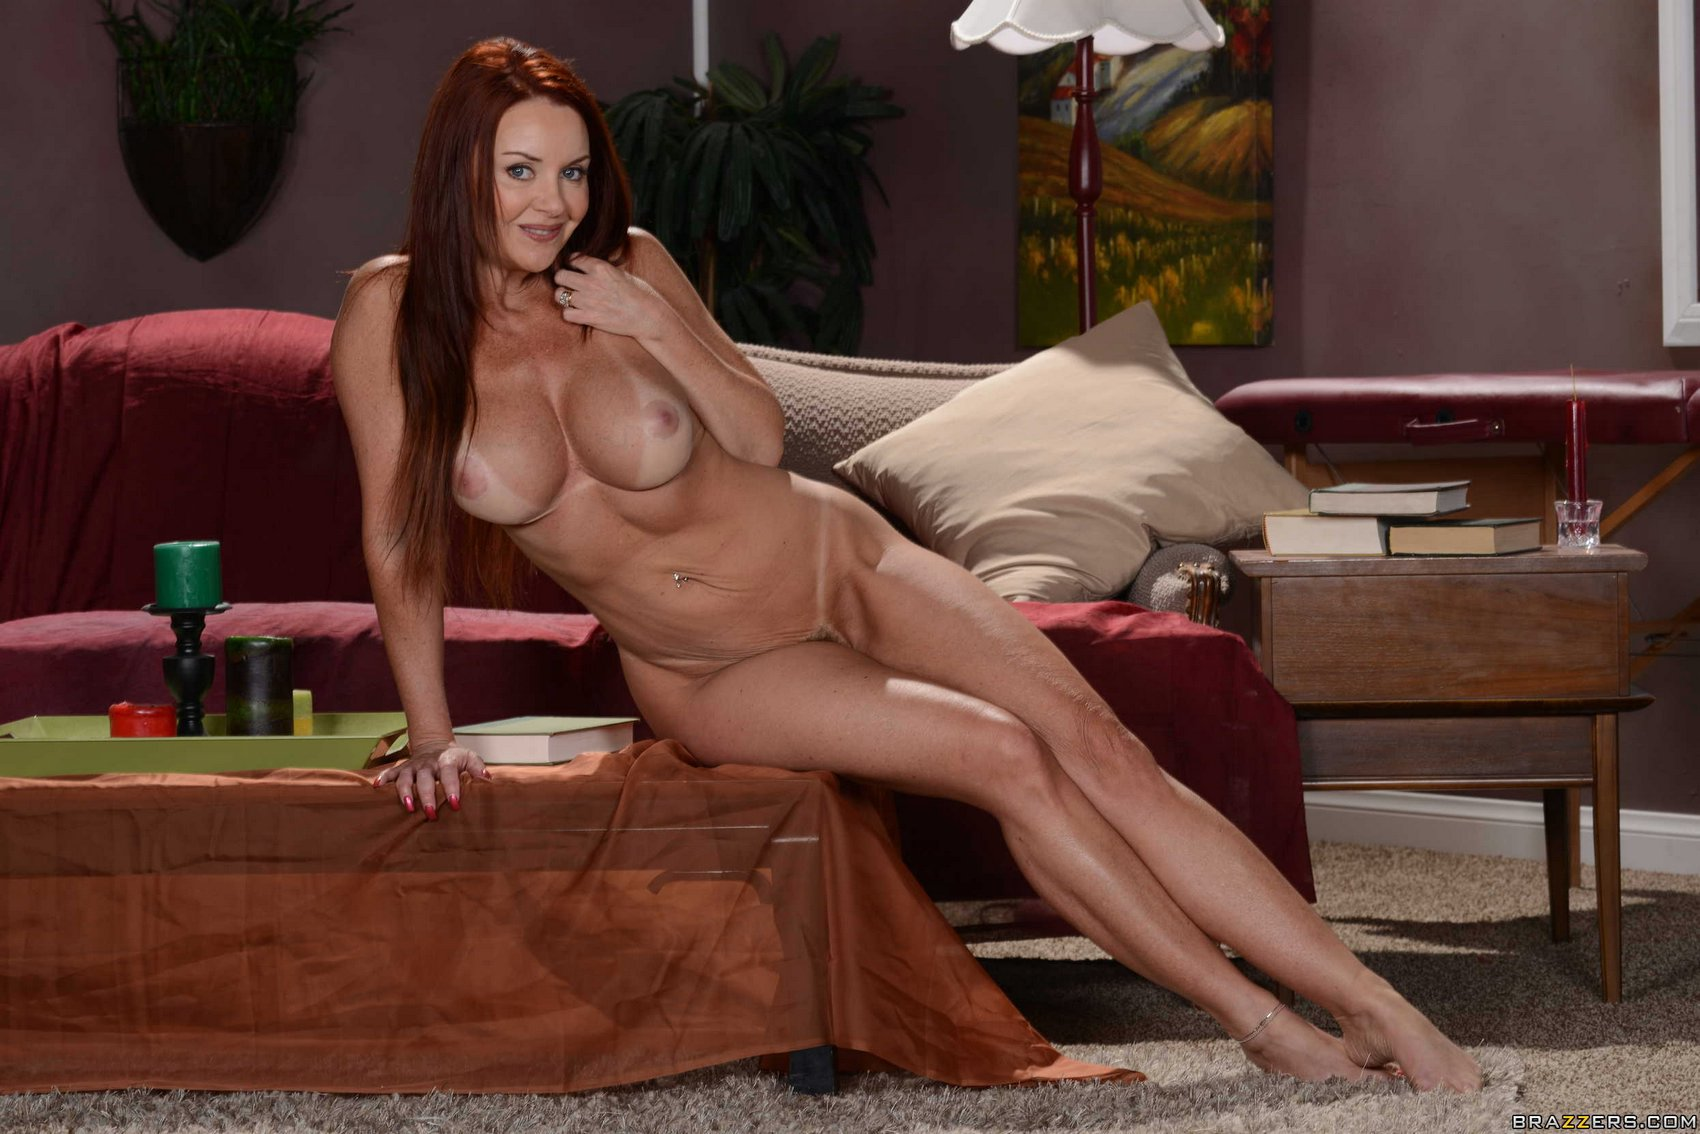 Consider, Janet mason porn star nude opinion